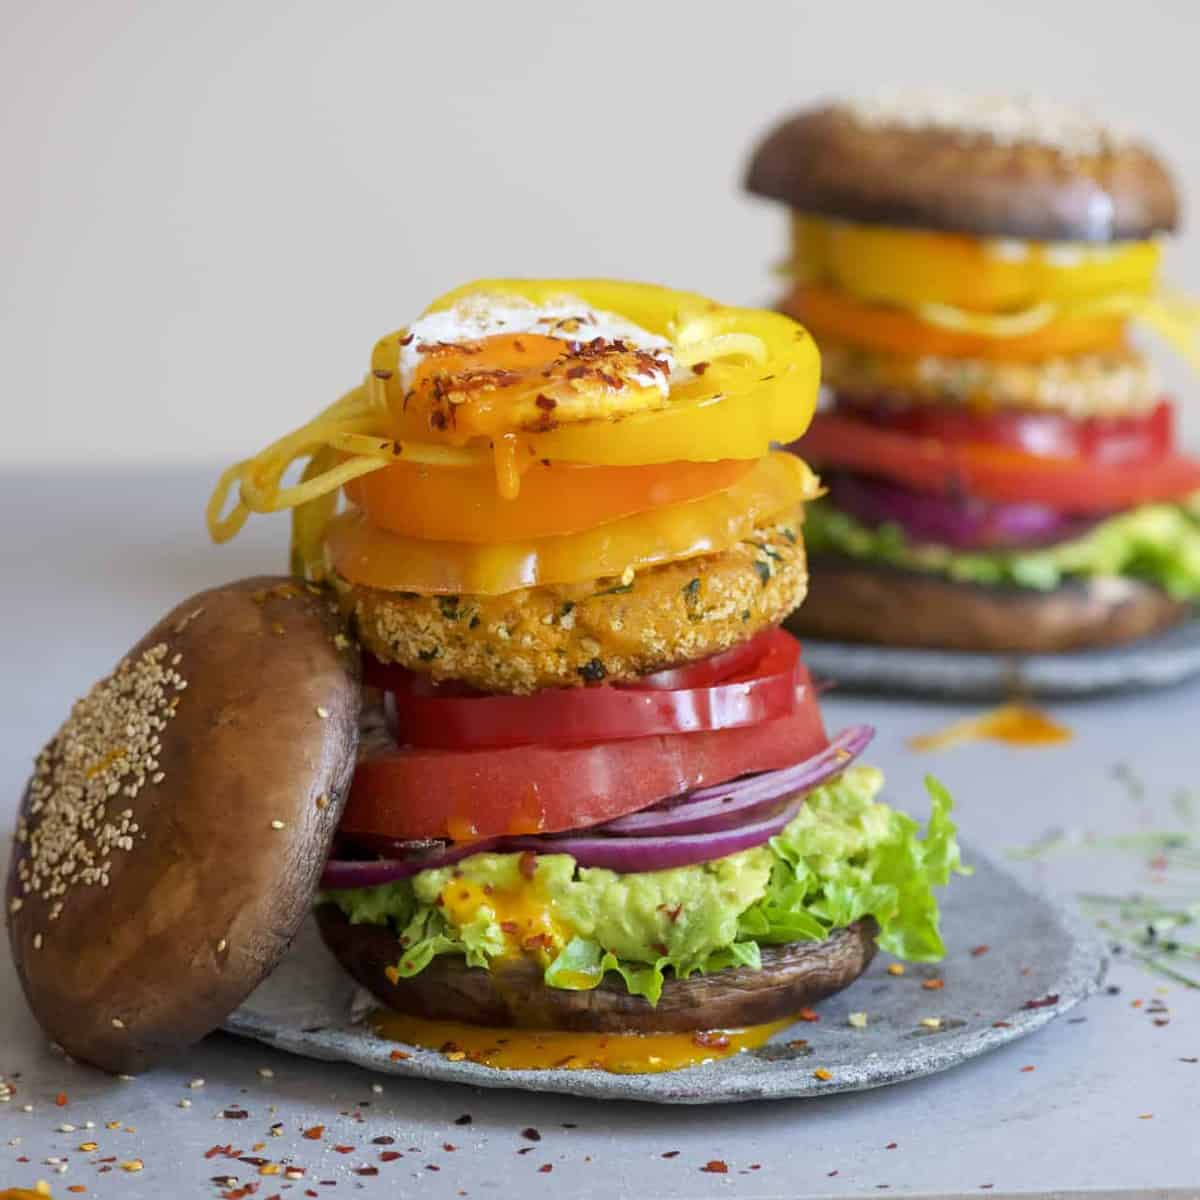 Portobello mushroom bun burger with veggies and sweet potato patty